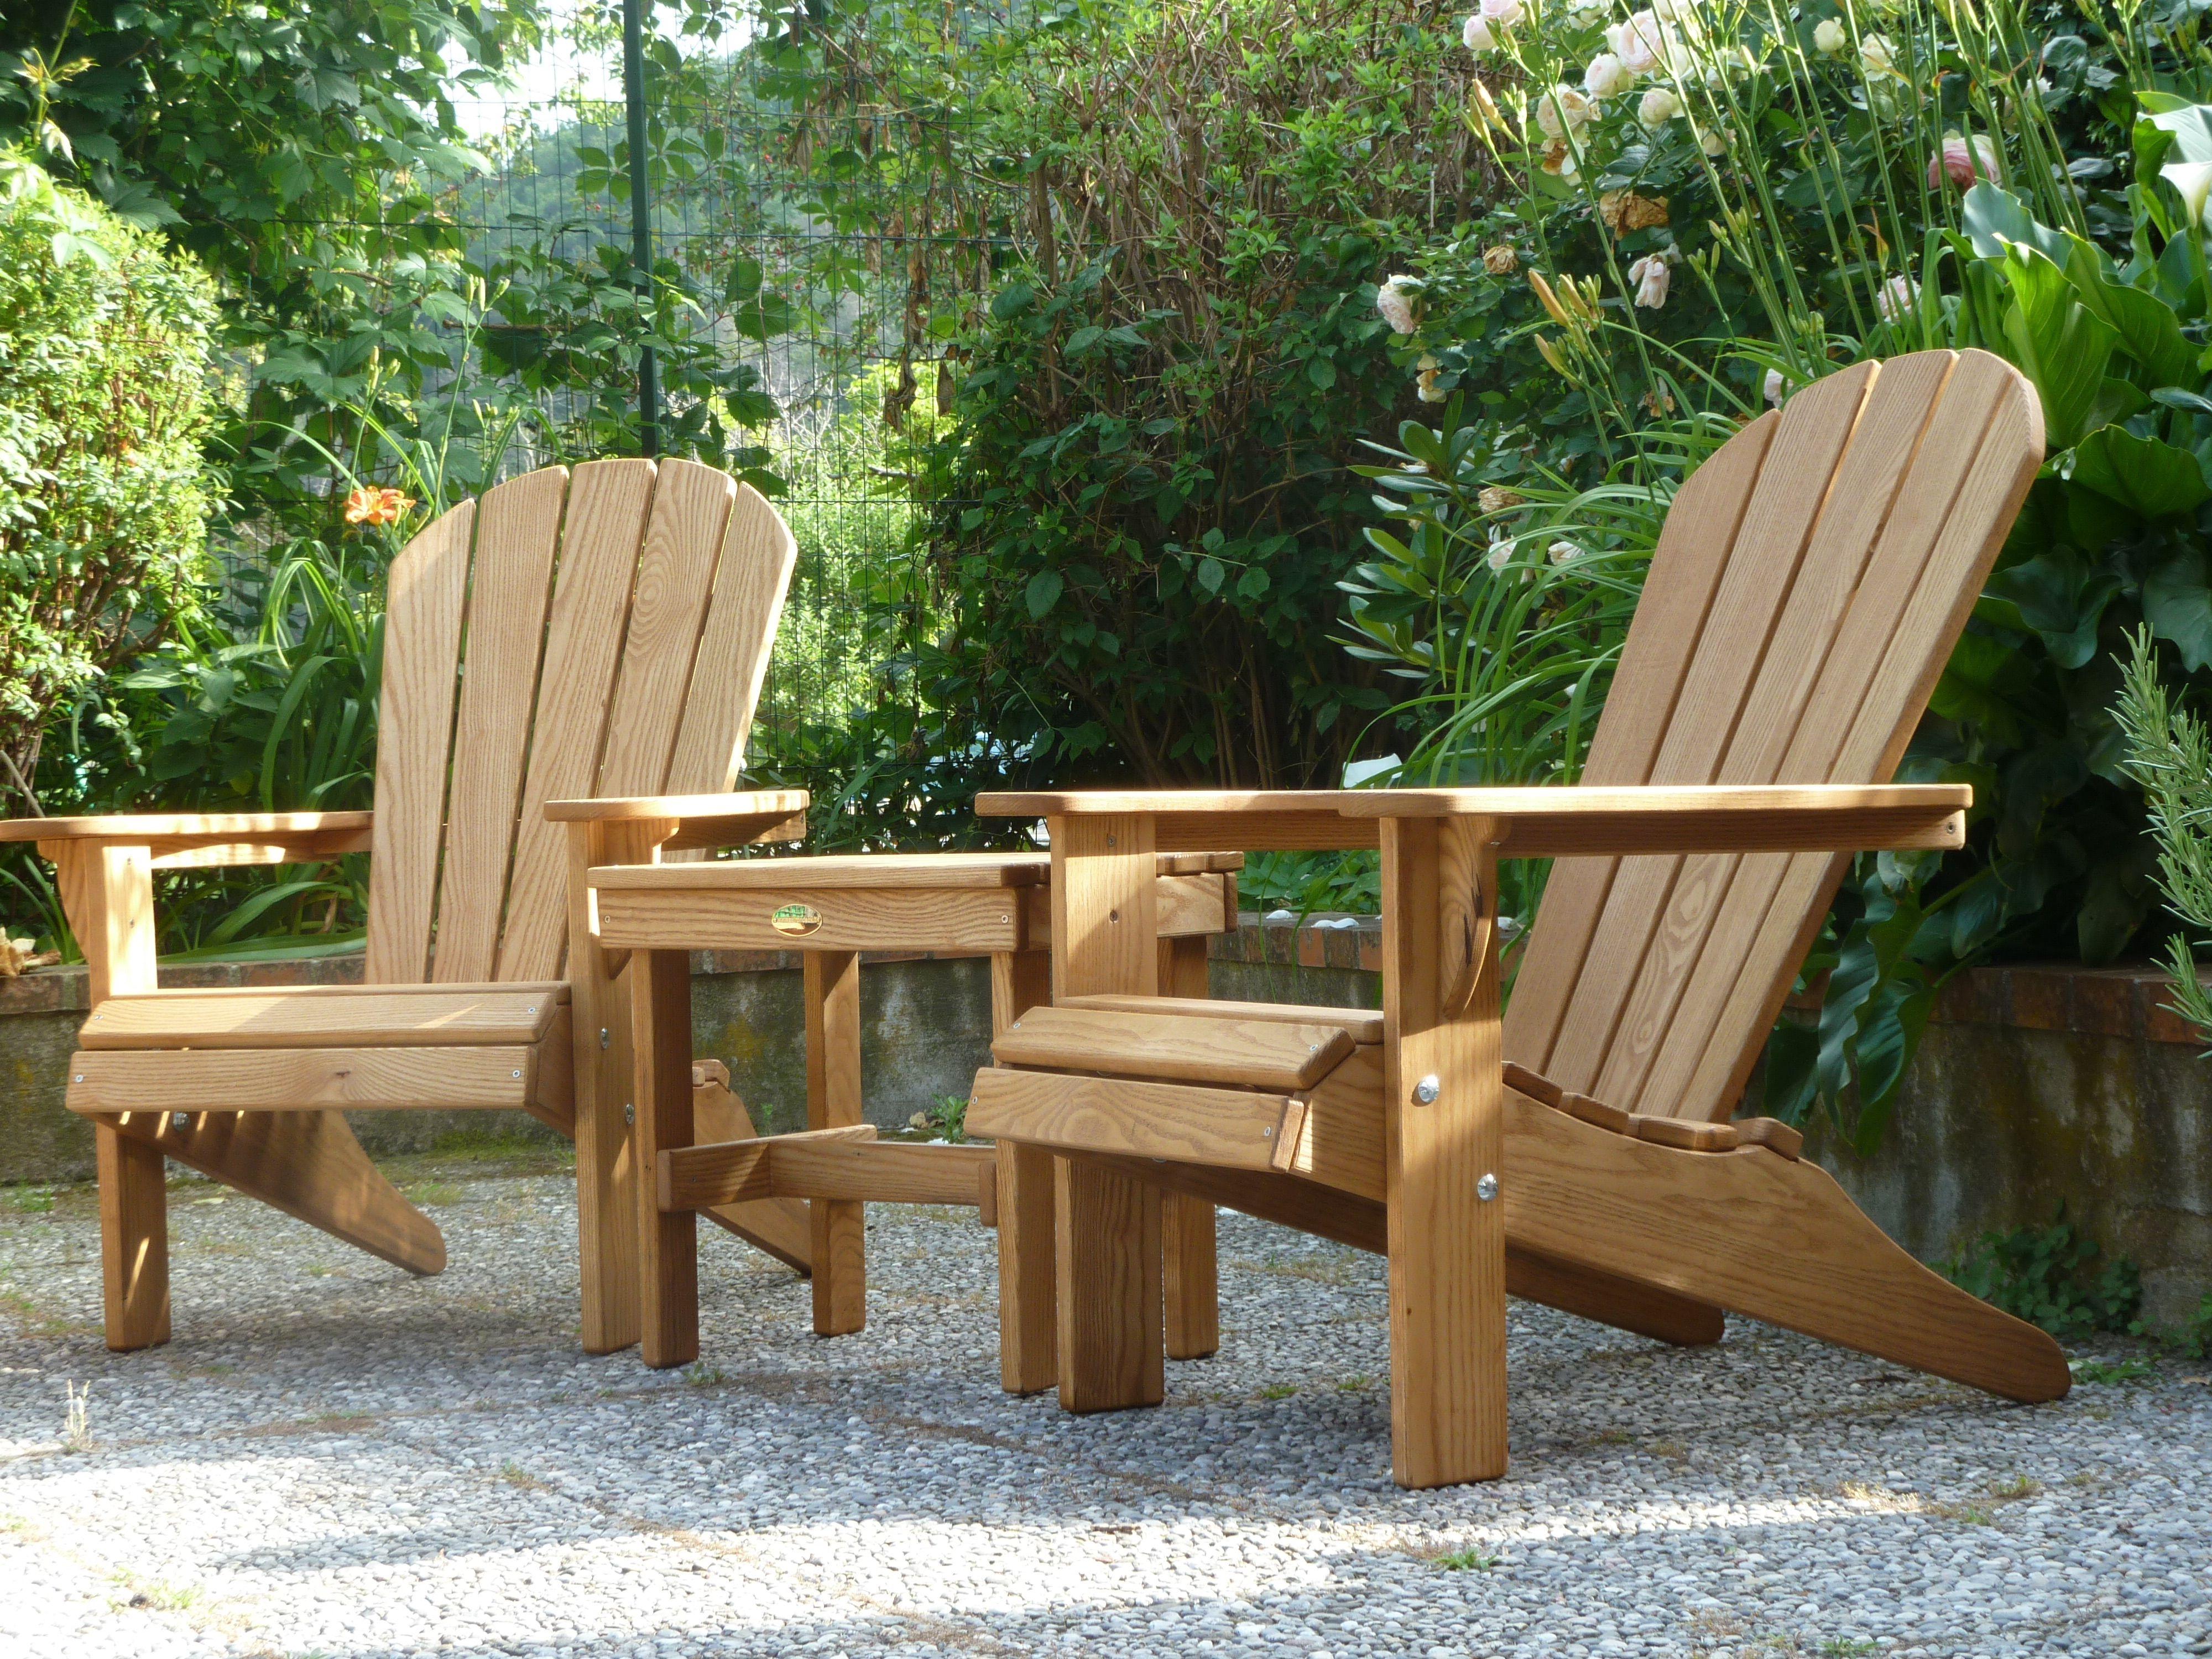 Sedie Adirondack ~ Annunci gratuiti sedie adirondack savona liguria varazze